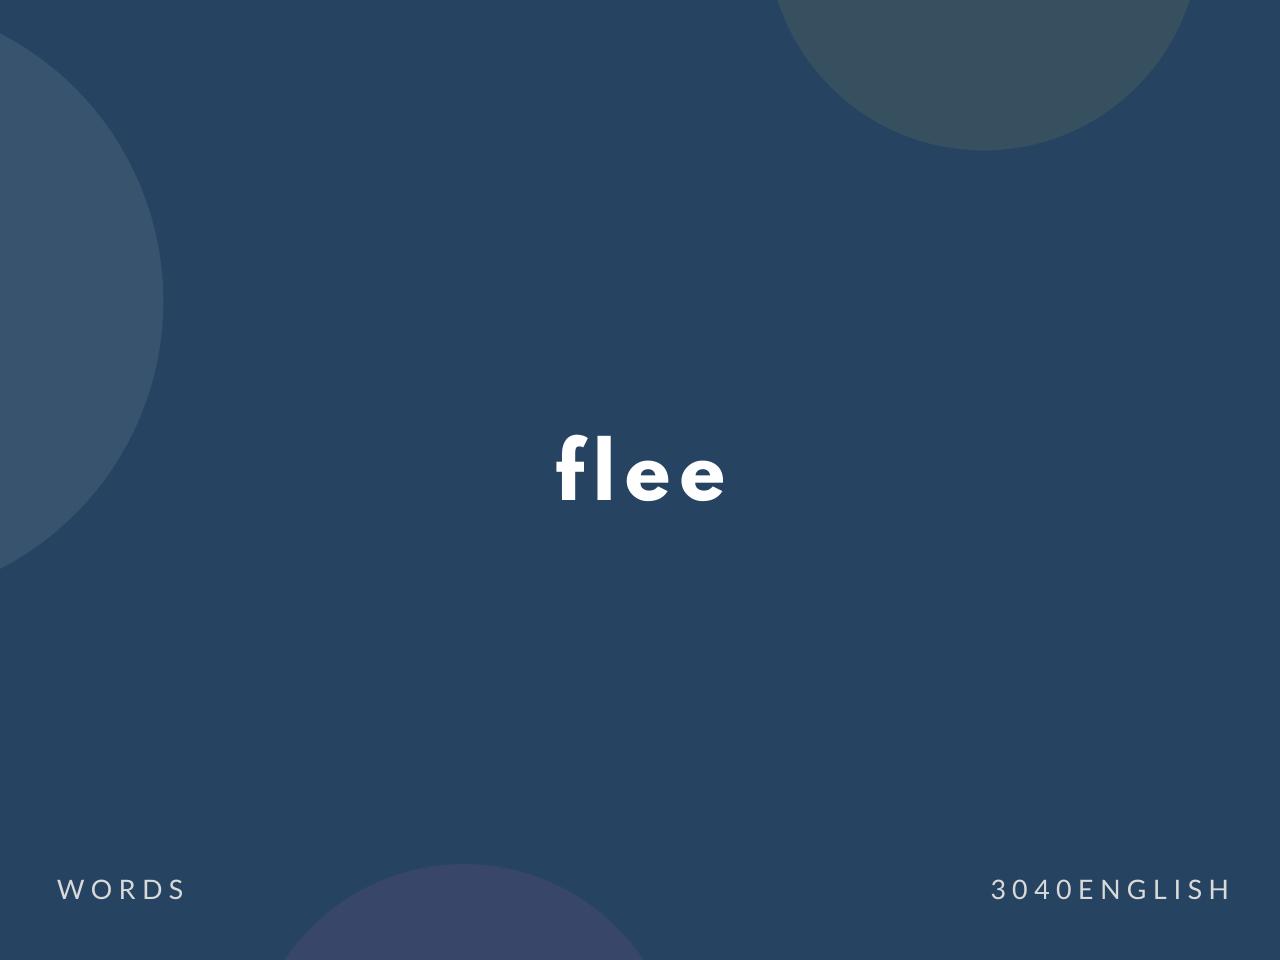 flee の意味と簡単な使い方【音読用例文あり】